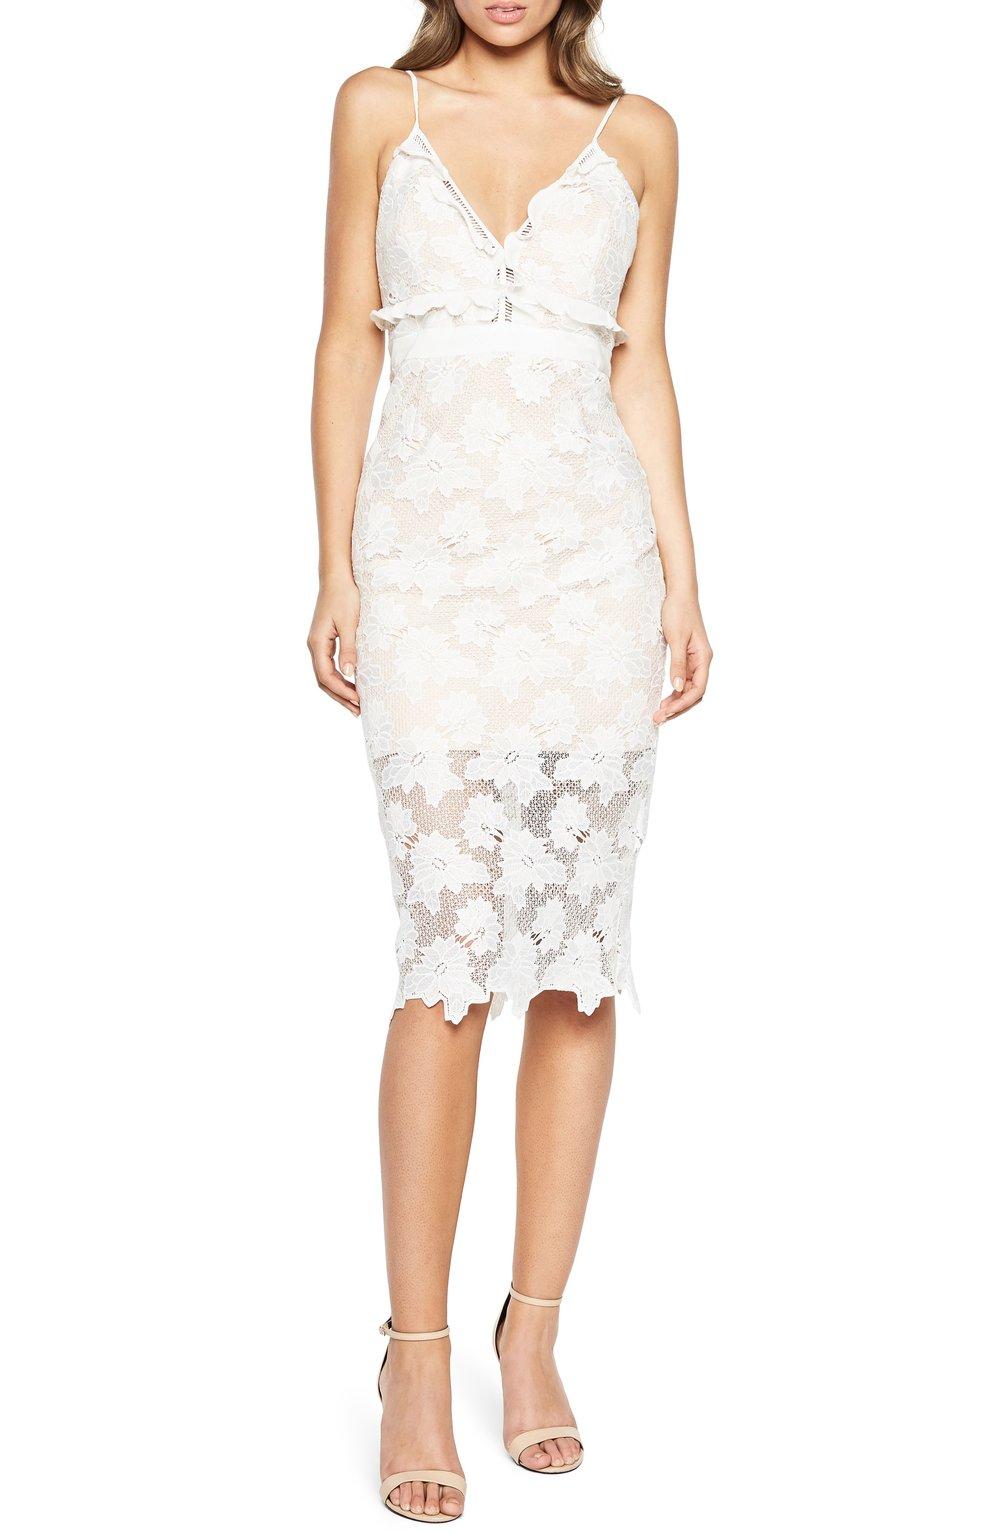 lace overlay dress.jpg